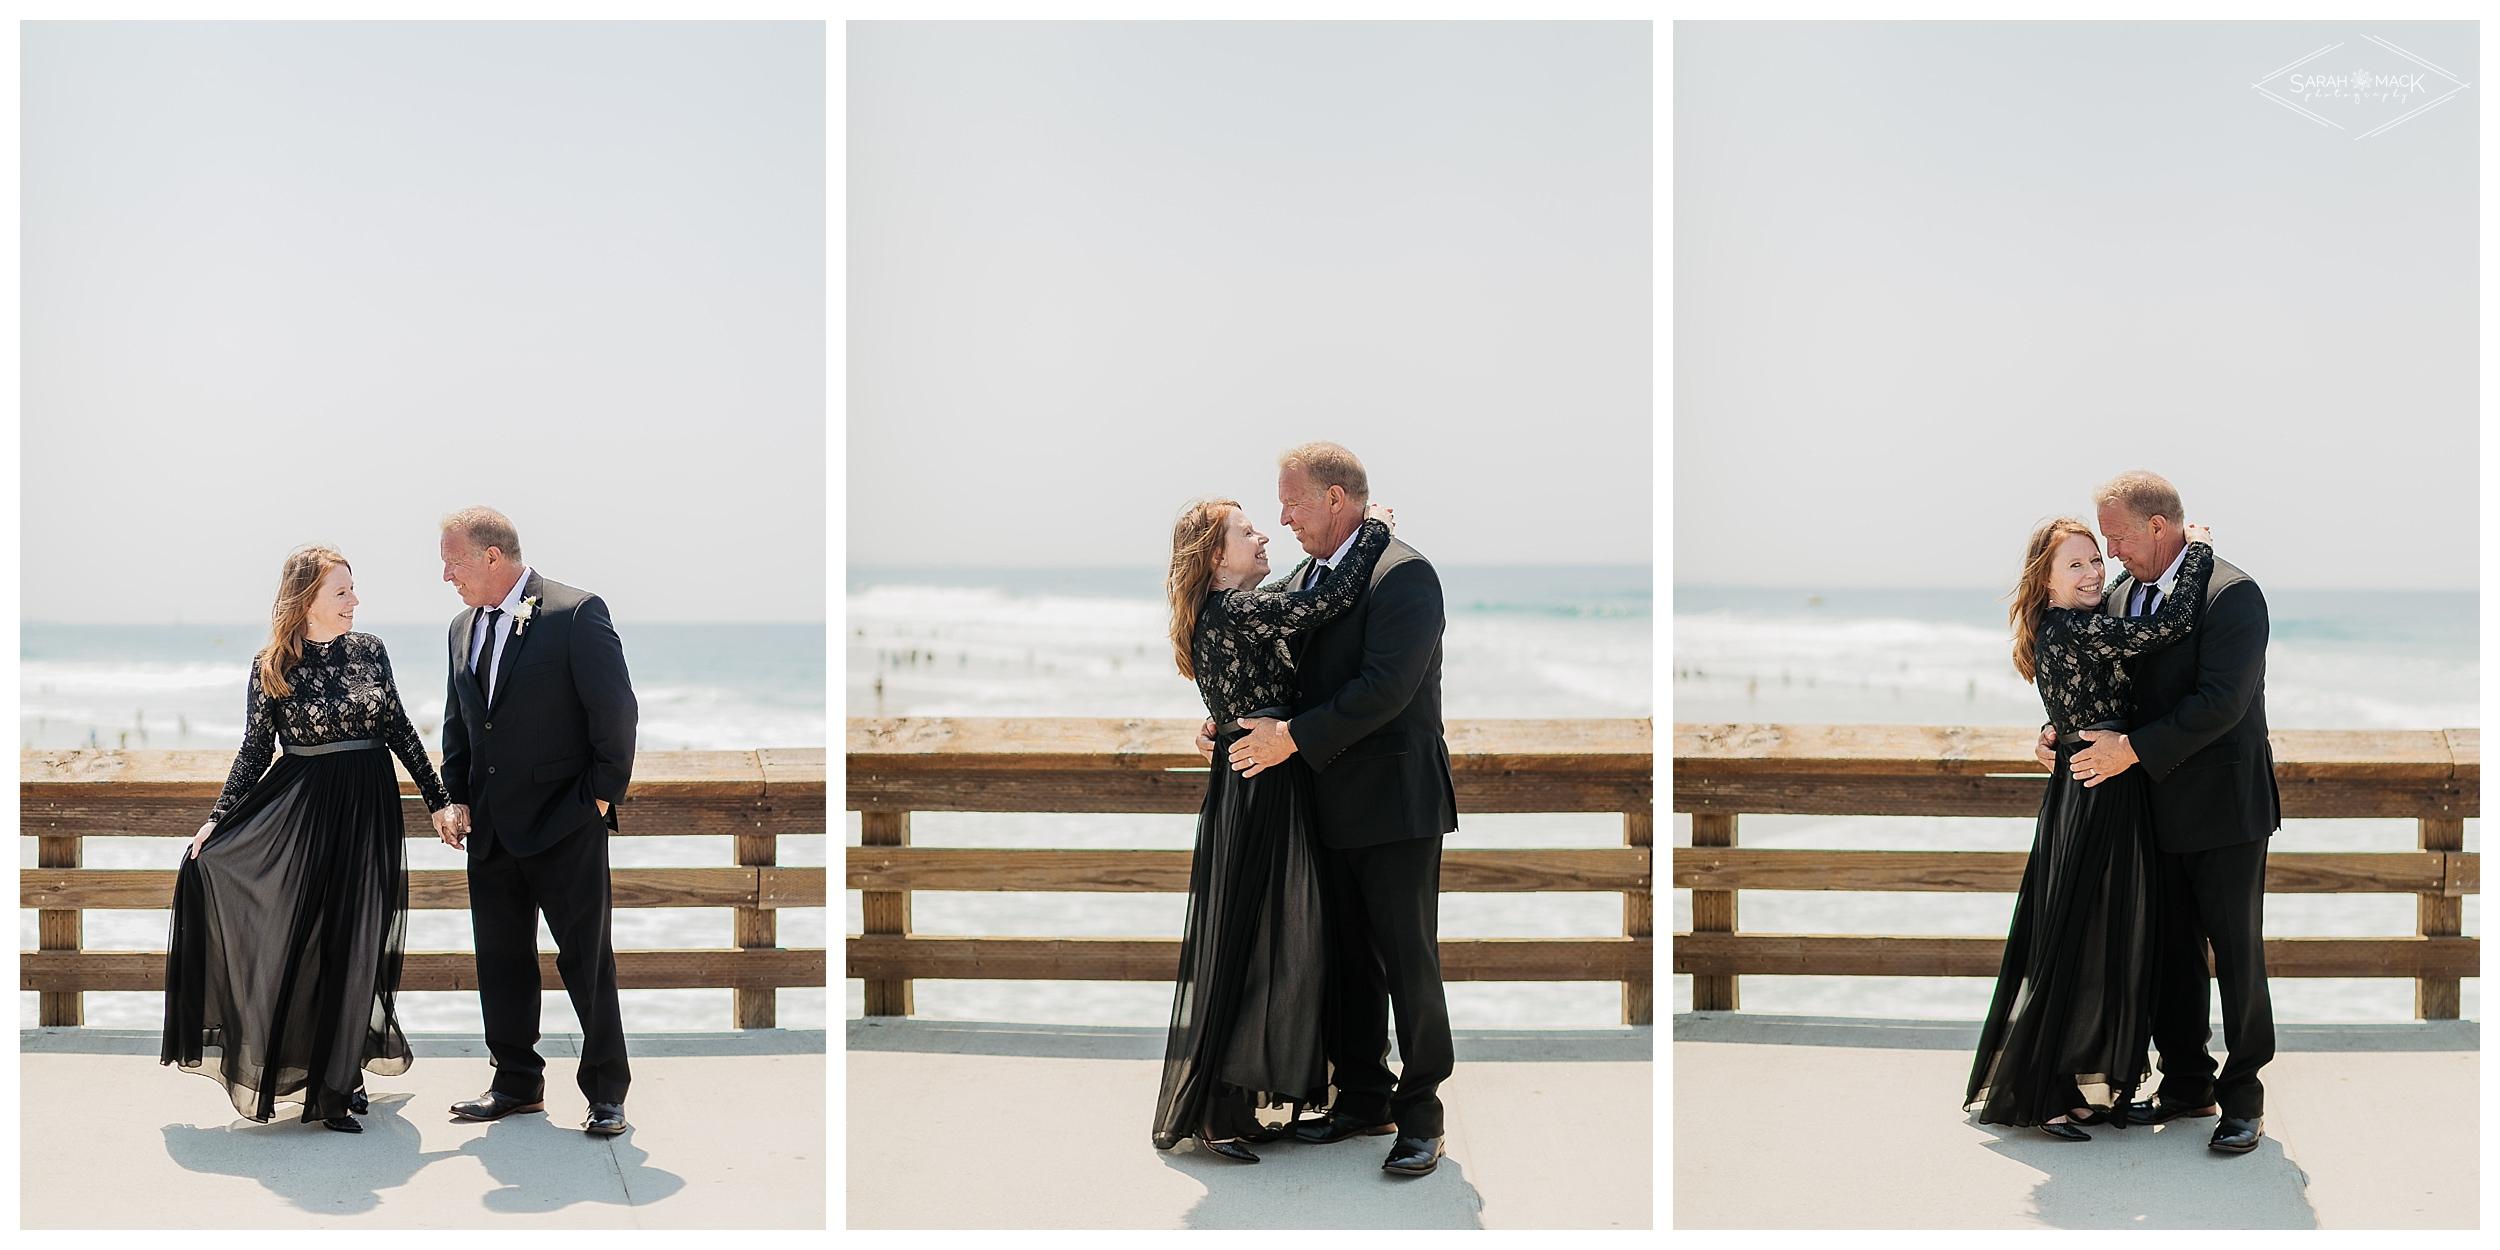 LM-Newport-Beach-Pier-Intimate-Wedding-Photography 166.jpg